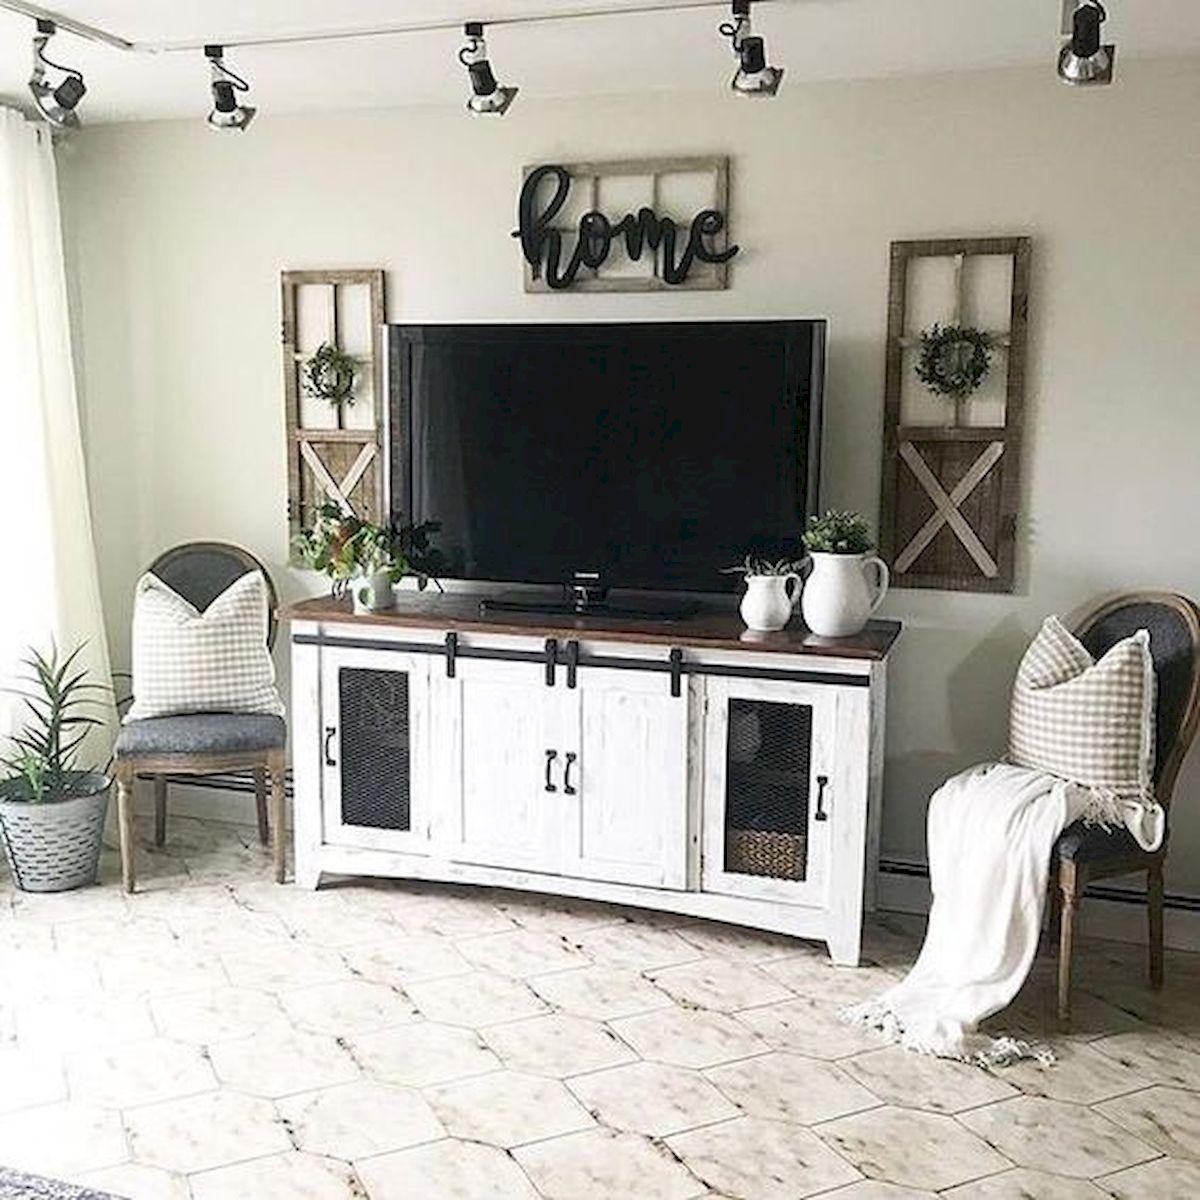 33 Best Farmhouse Living Room Tv Stand Design Ideas Living Room Tv Stand Farmhouse Decor Living Room Modern Farmhouse Living Room Decor #television #in #living #room #designs